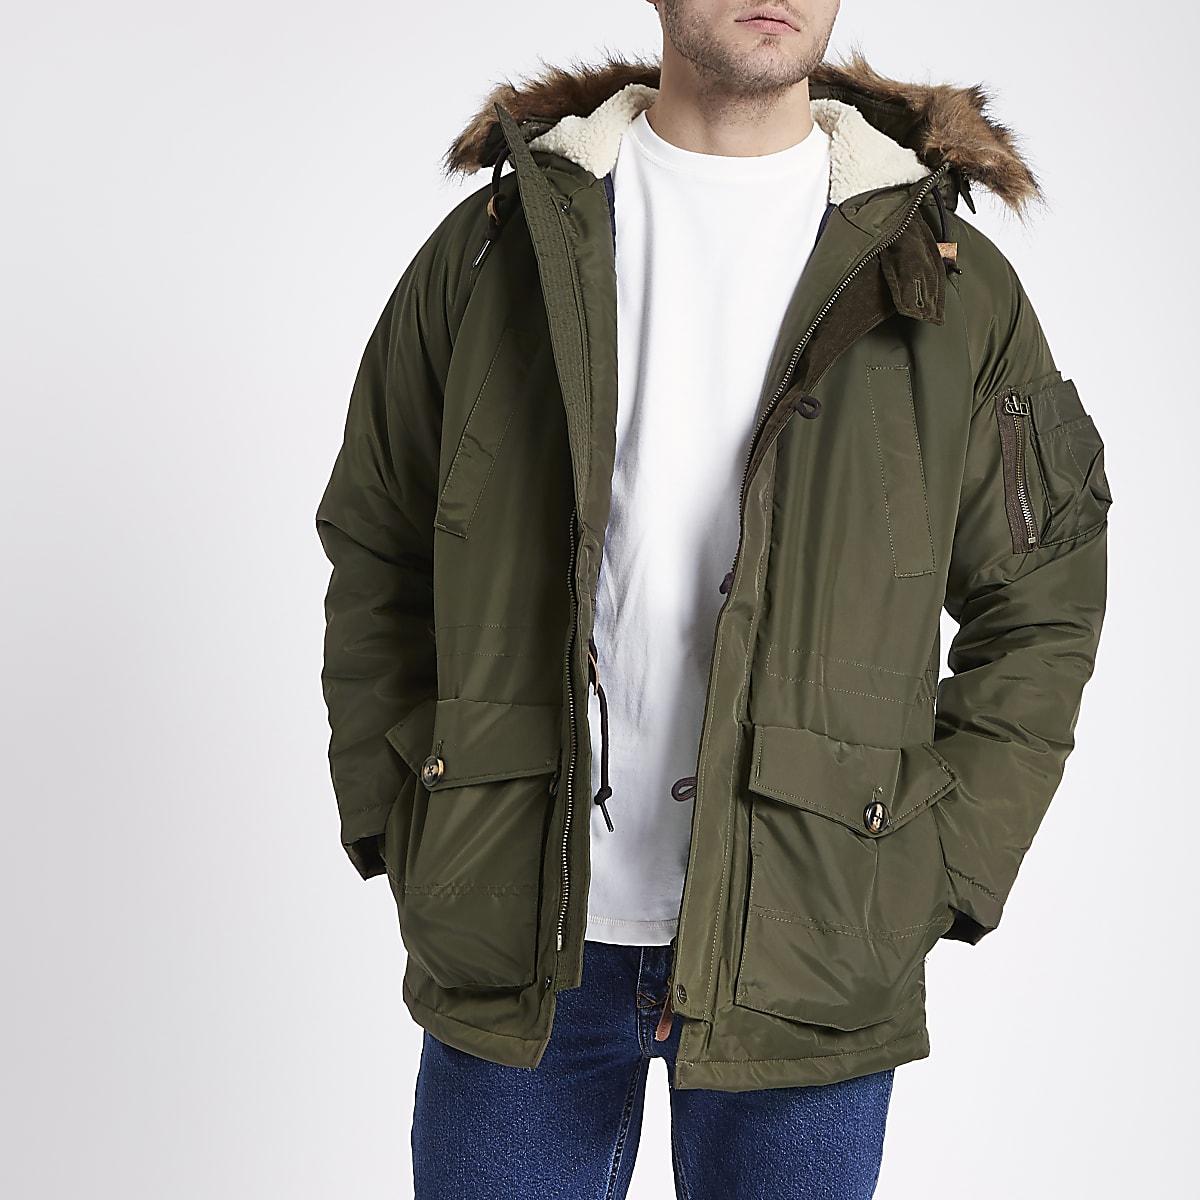 Lee dark green faux fur trim parka jacket